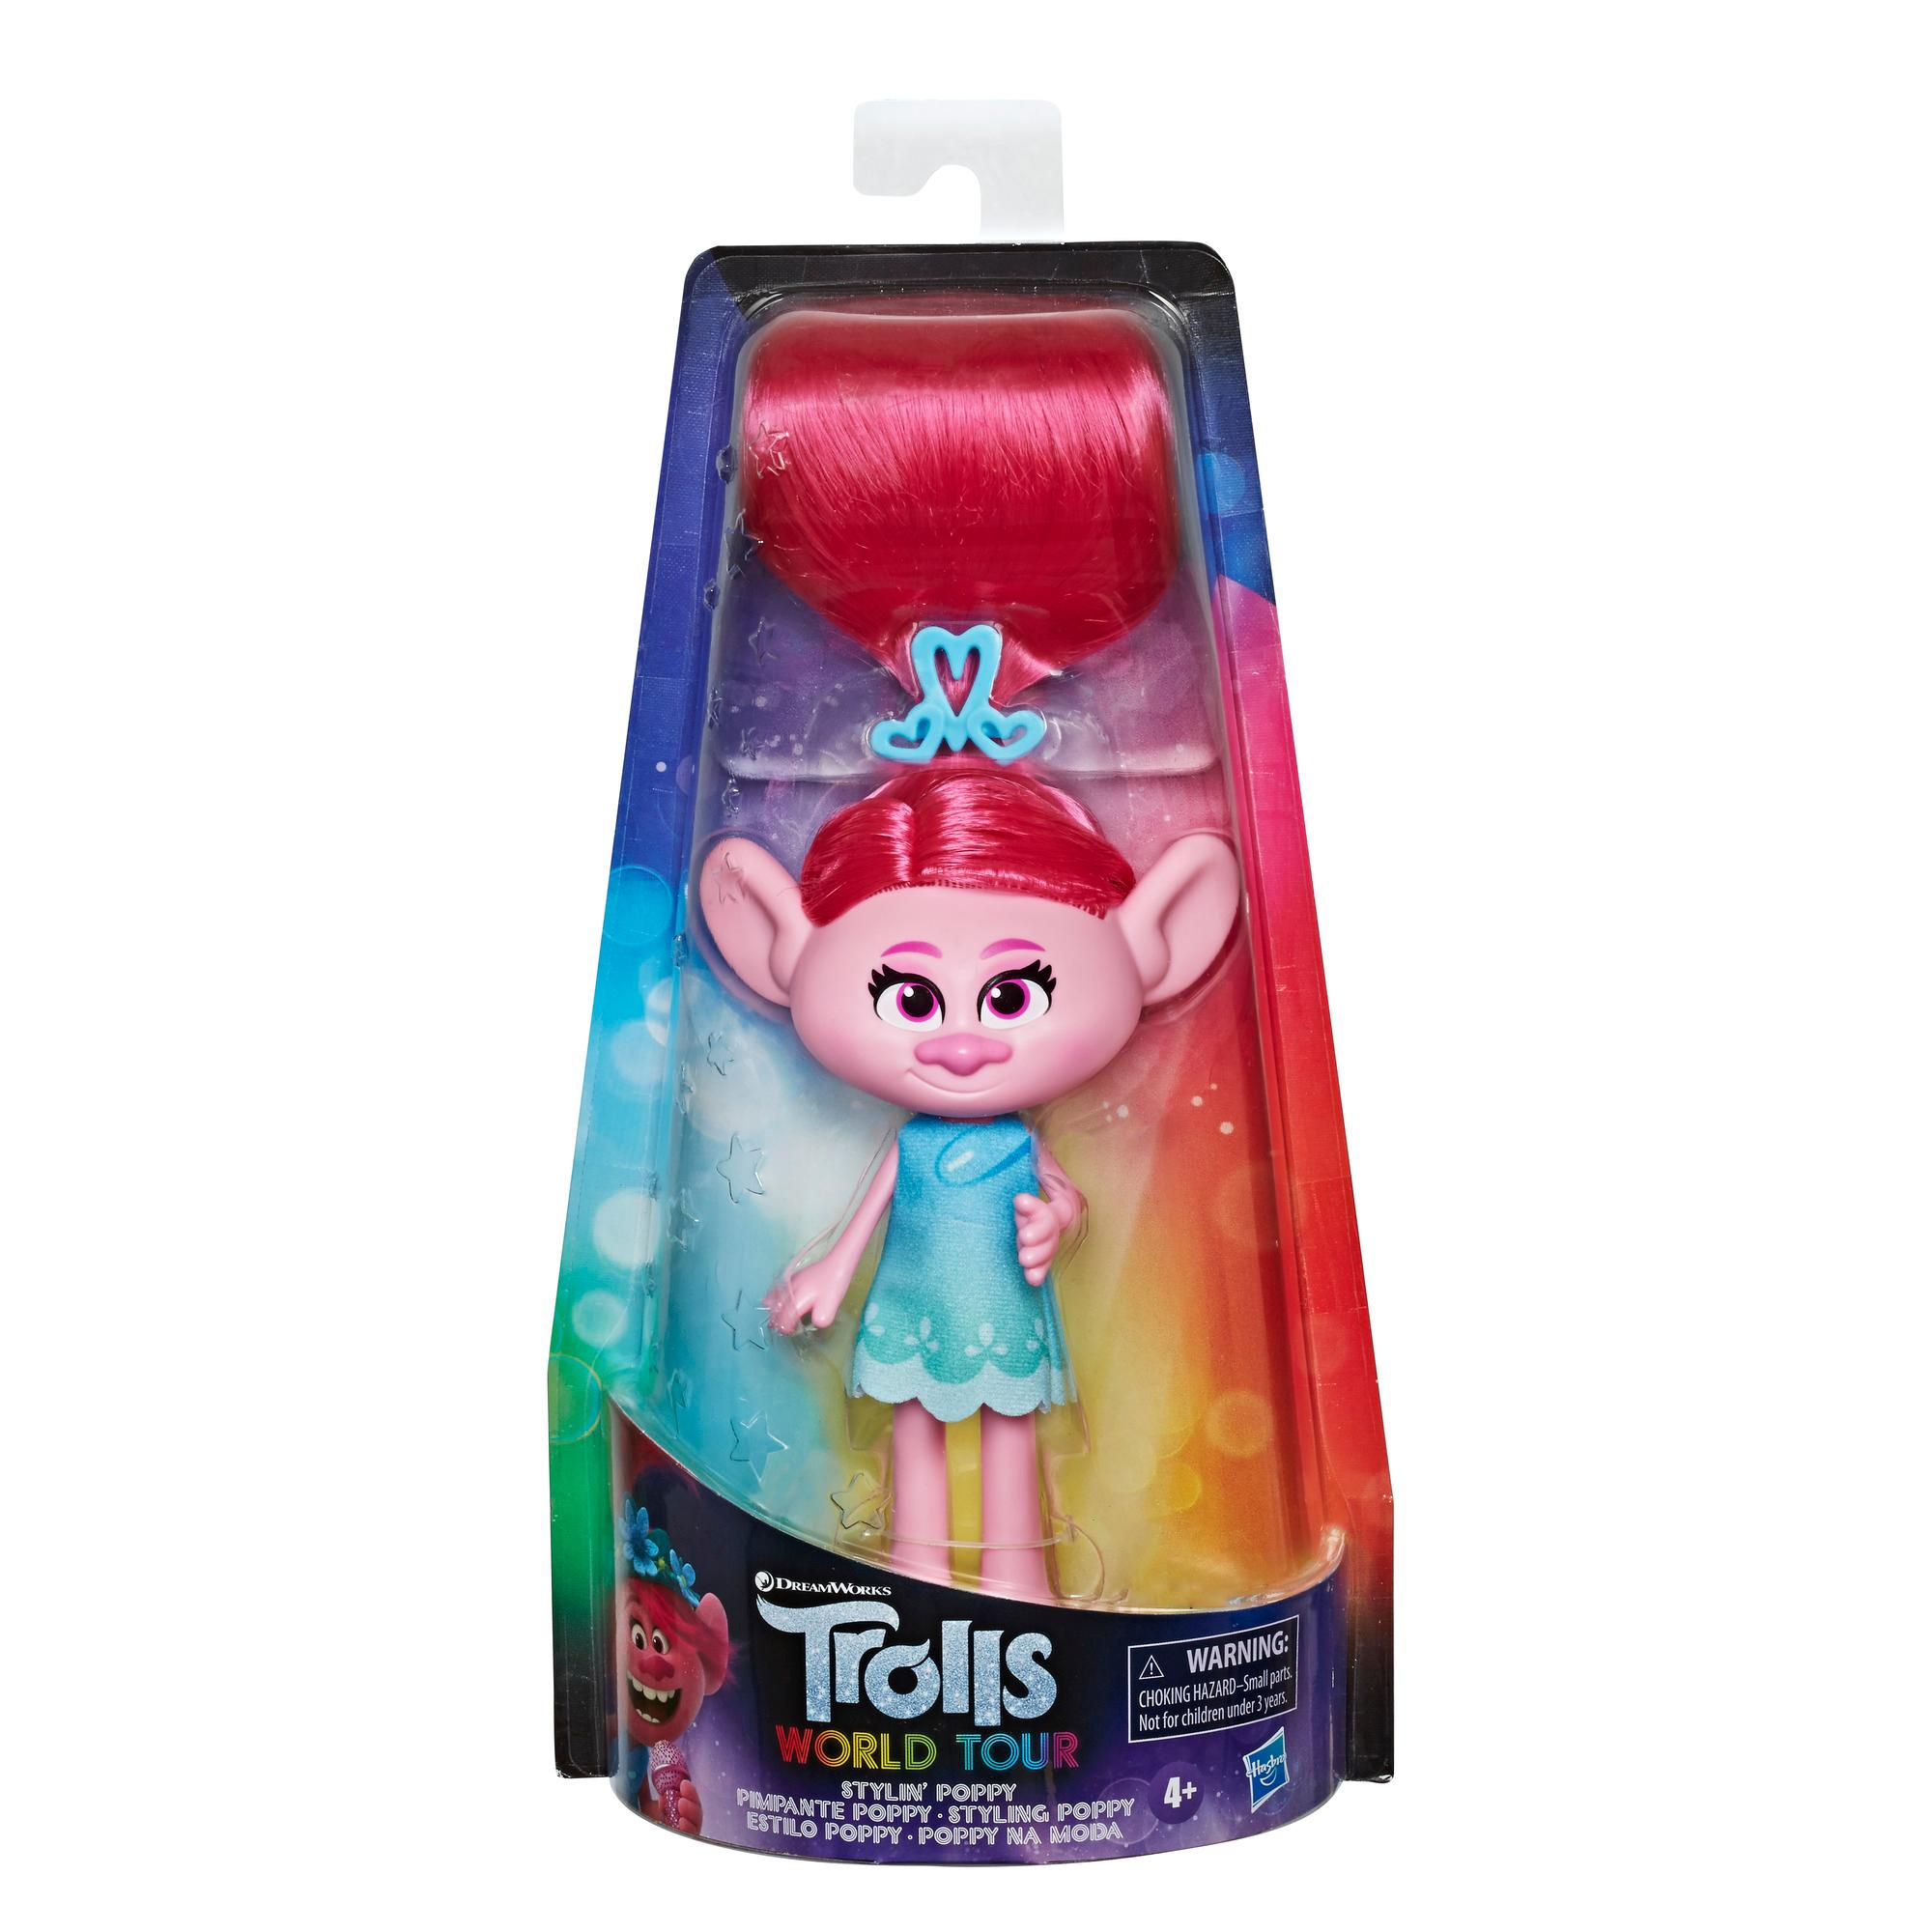 DreamWorks Trolls Styling Poppy